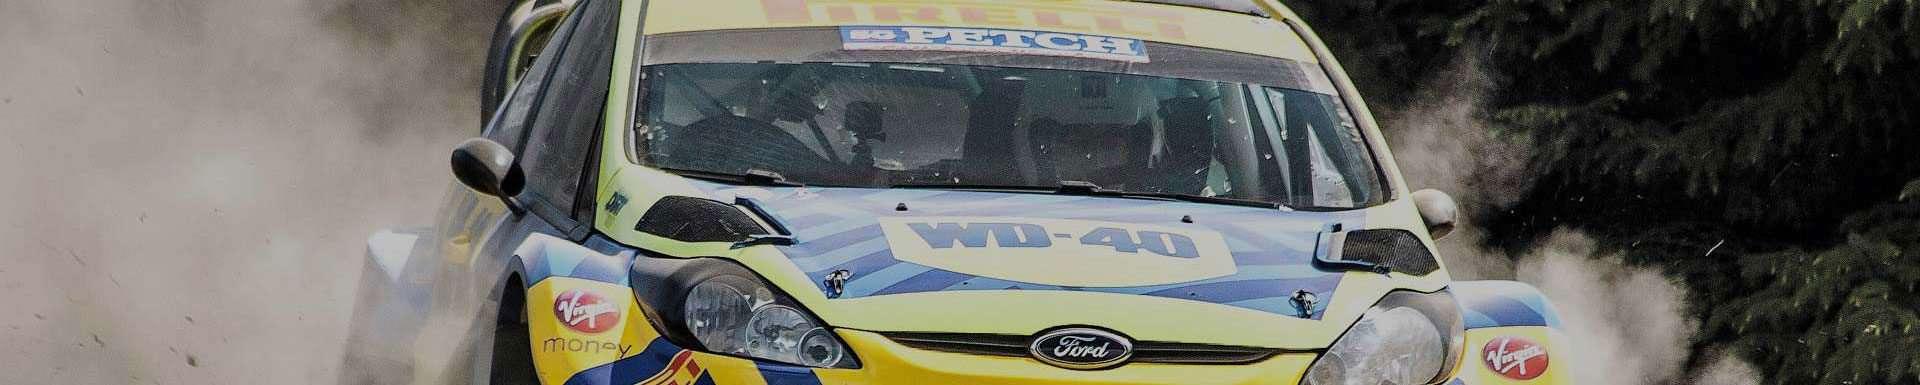 banner rally 1920x385